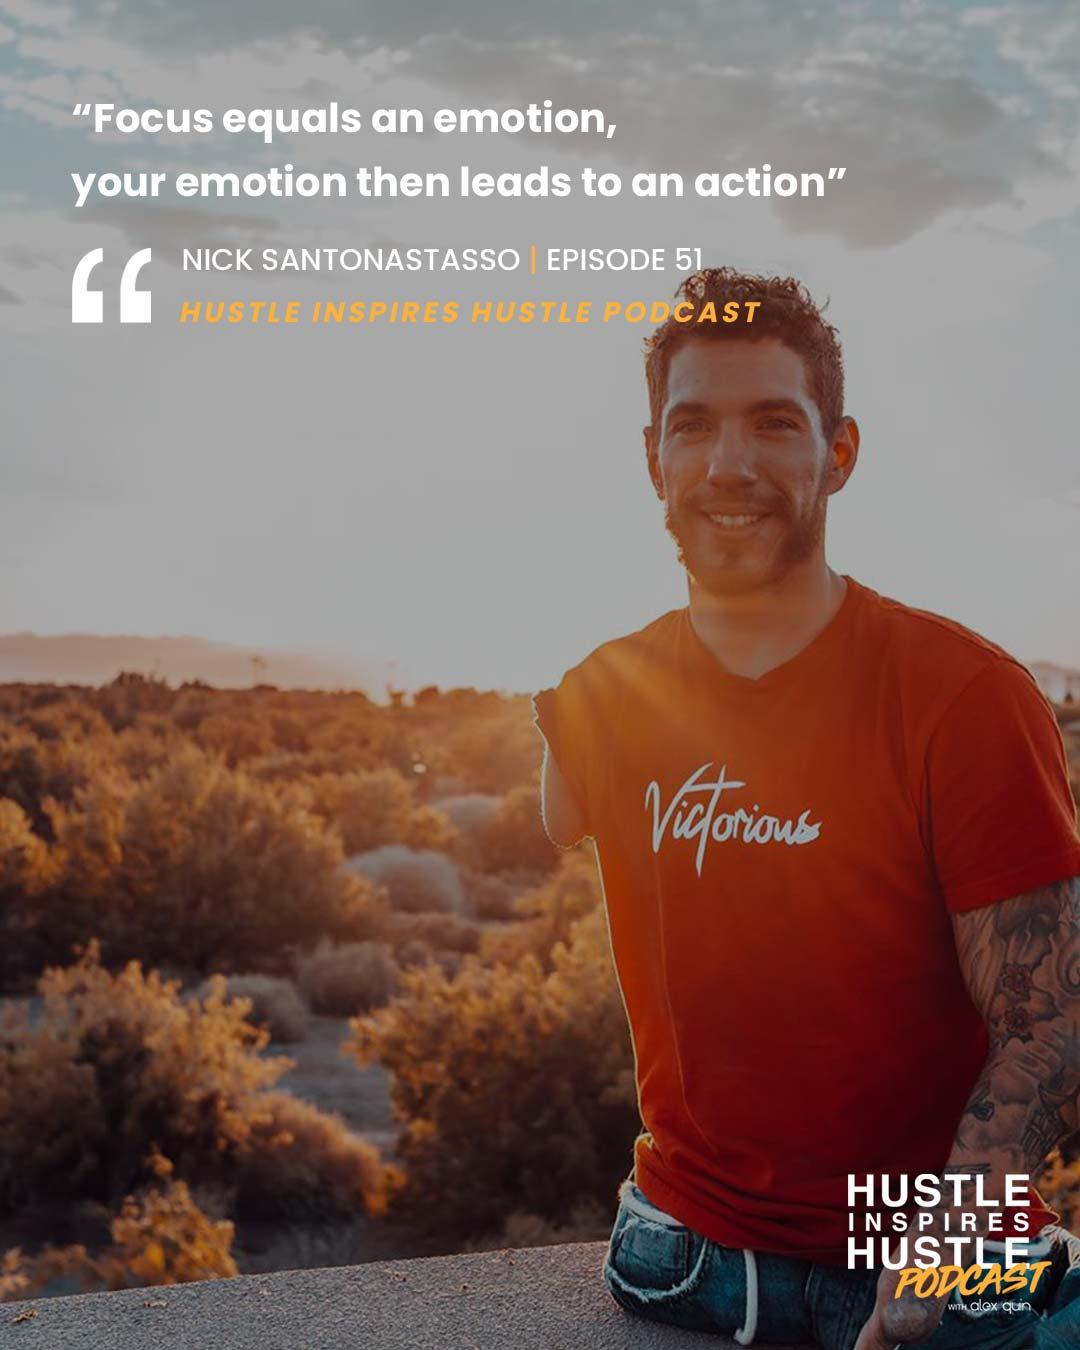 Nick Santonastasso Hustle Inspires Hustle Podcast